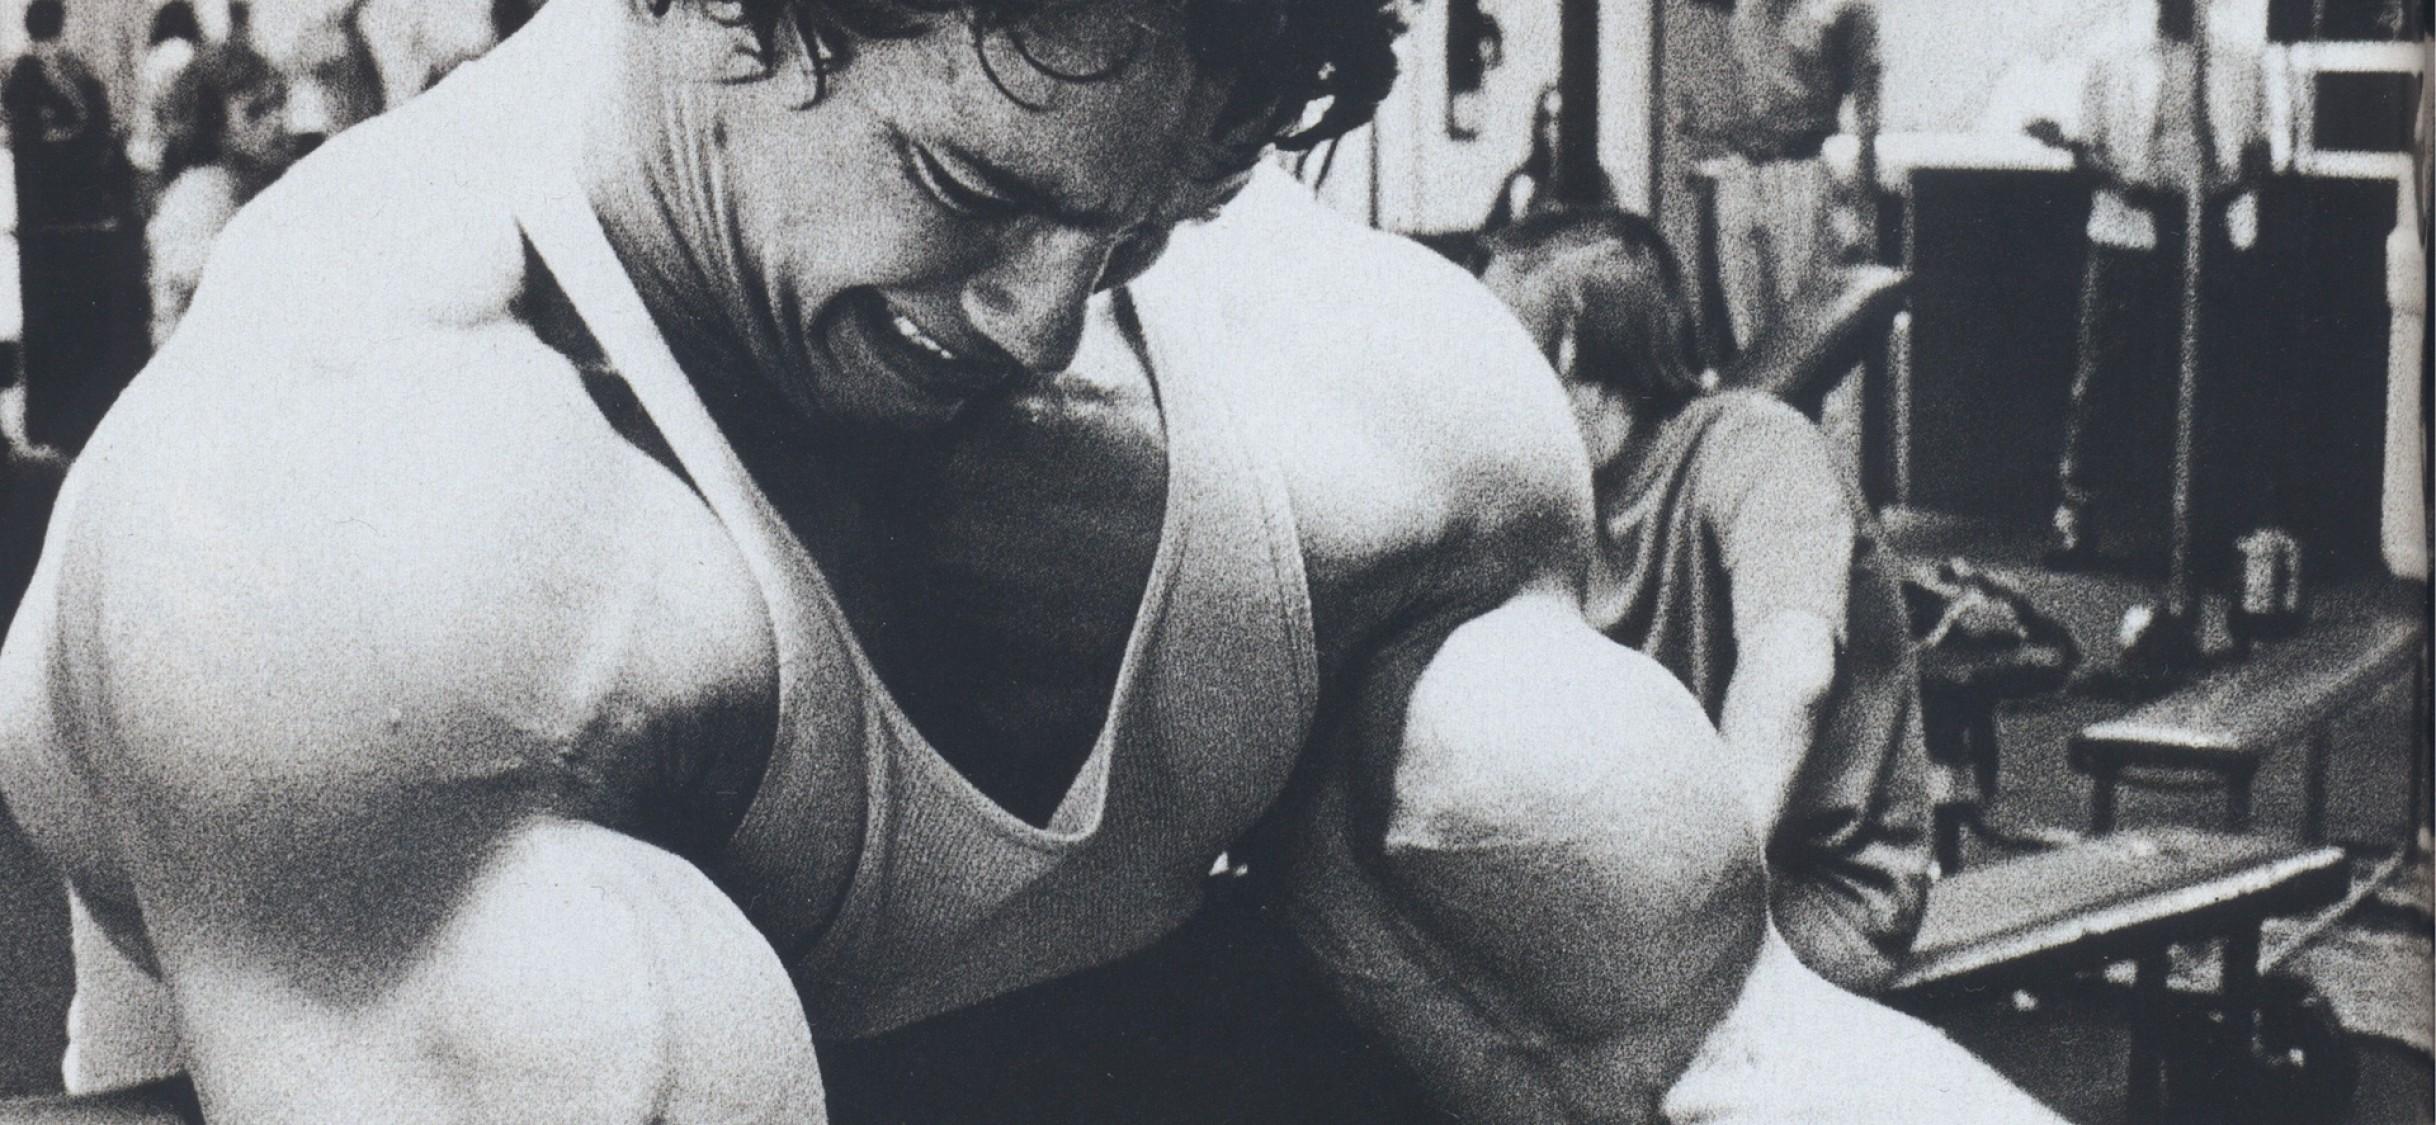 Arnold Schwarzenegger Bodybuilding Hd Wallpaper Iphone X Hd Wallpaper Wallpapers Net